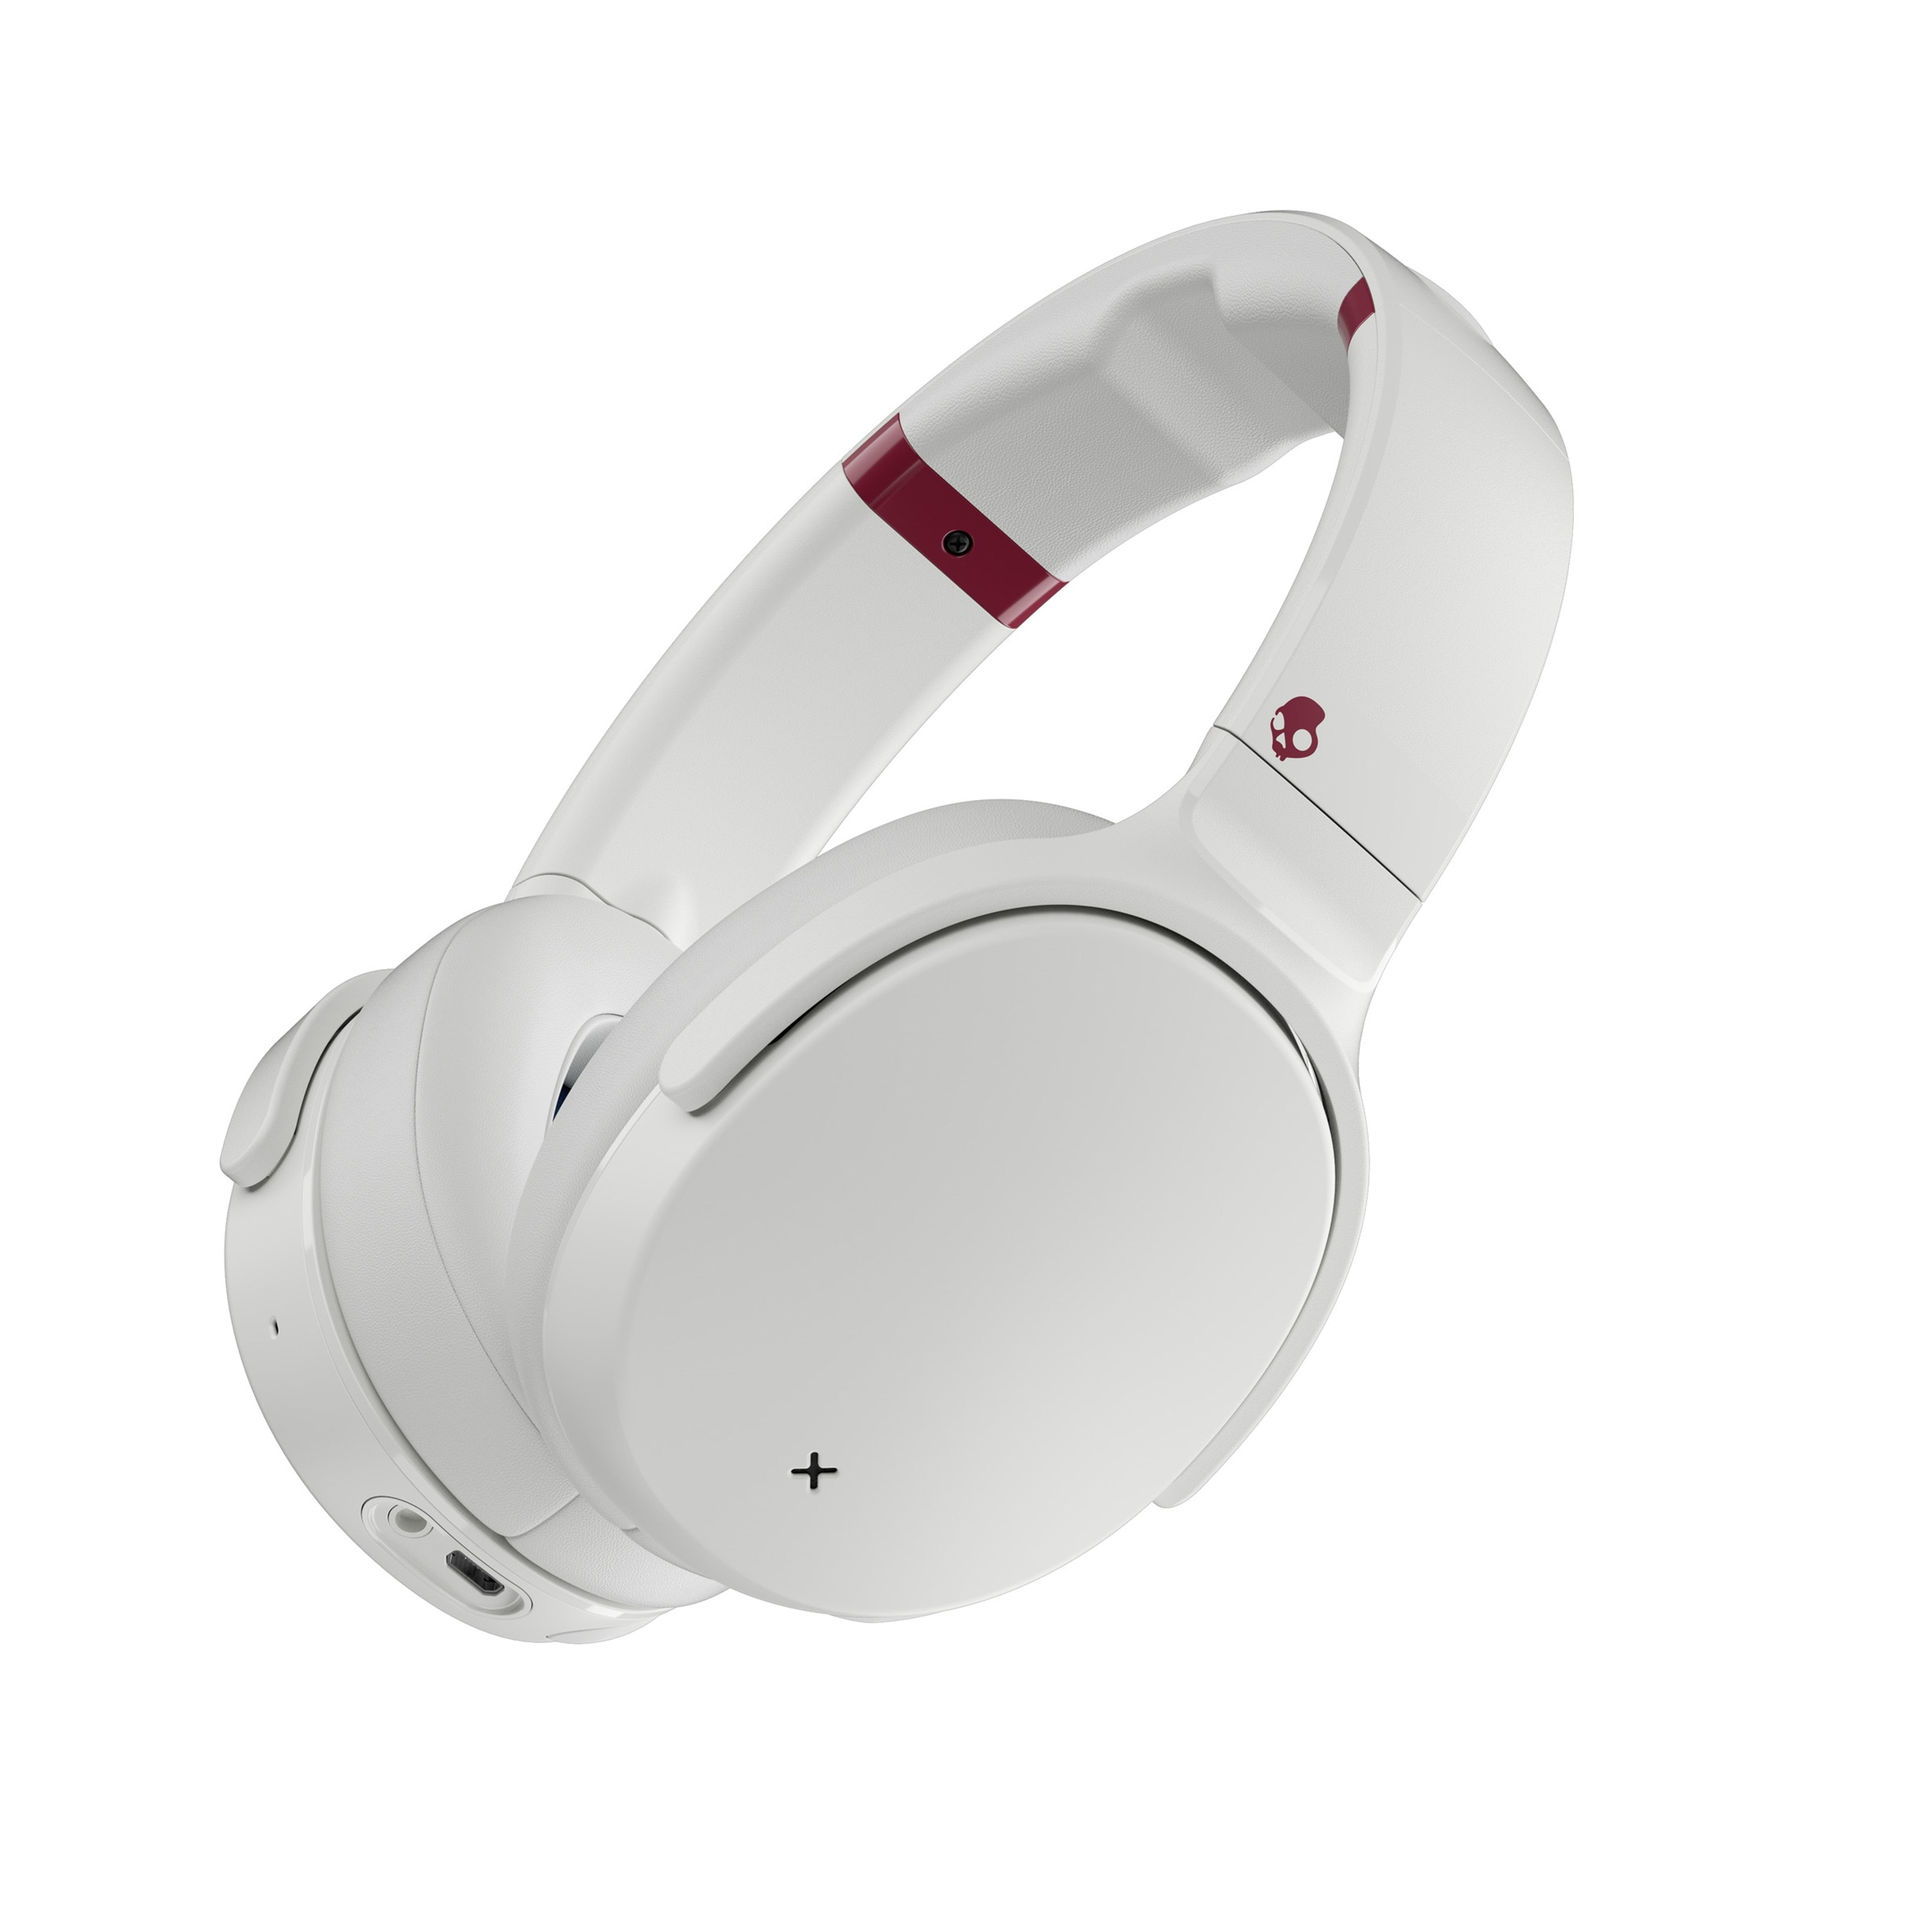 Skullcandy Venue Vice/Grey/Crimson Active Noise Cancelling Bluetooth Headphones - 2